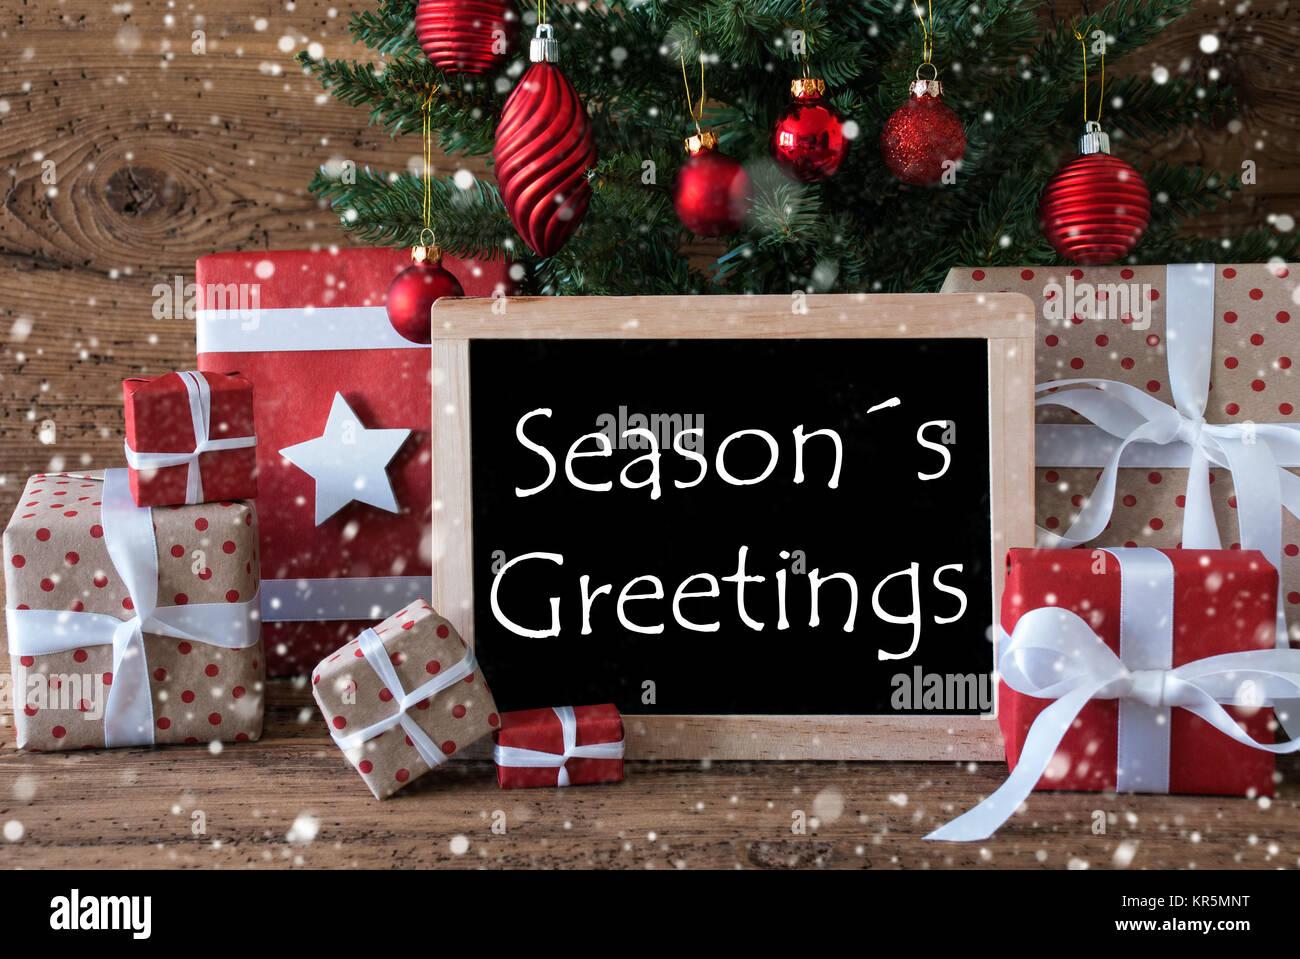 Seasons greetings christmas stock photos seasons greetings colorful christmas tree with snowflakestext seasons greetings stock image kristyandbryce Images